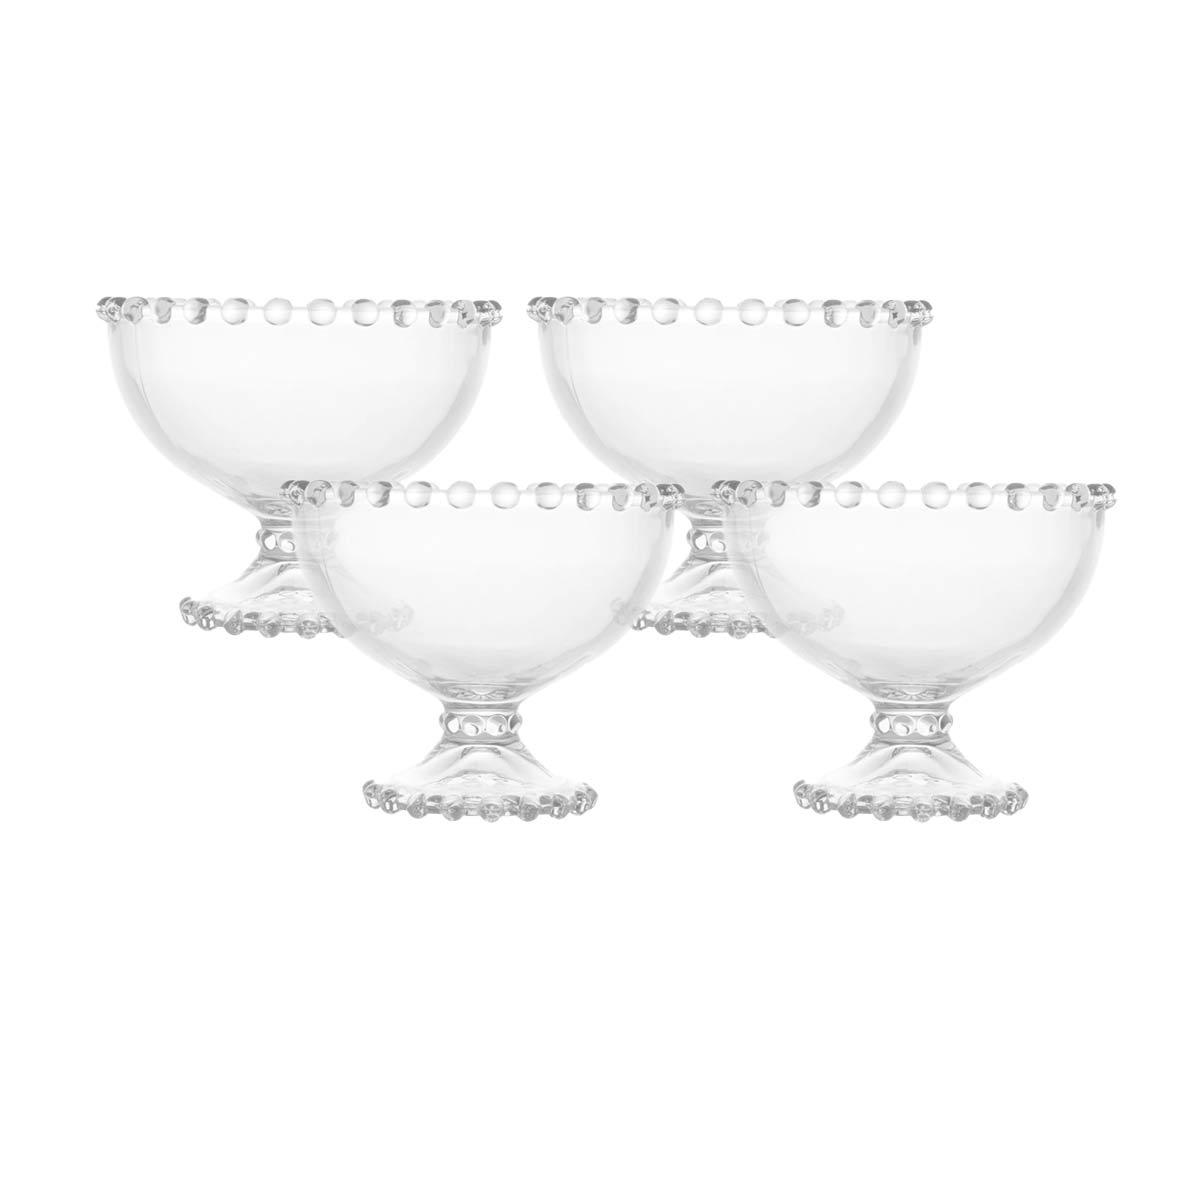 Kit 4 Taças Cristal de Chumbo para Sobremesa Pearl Wolff  - Lemis